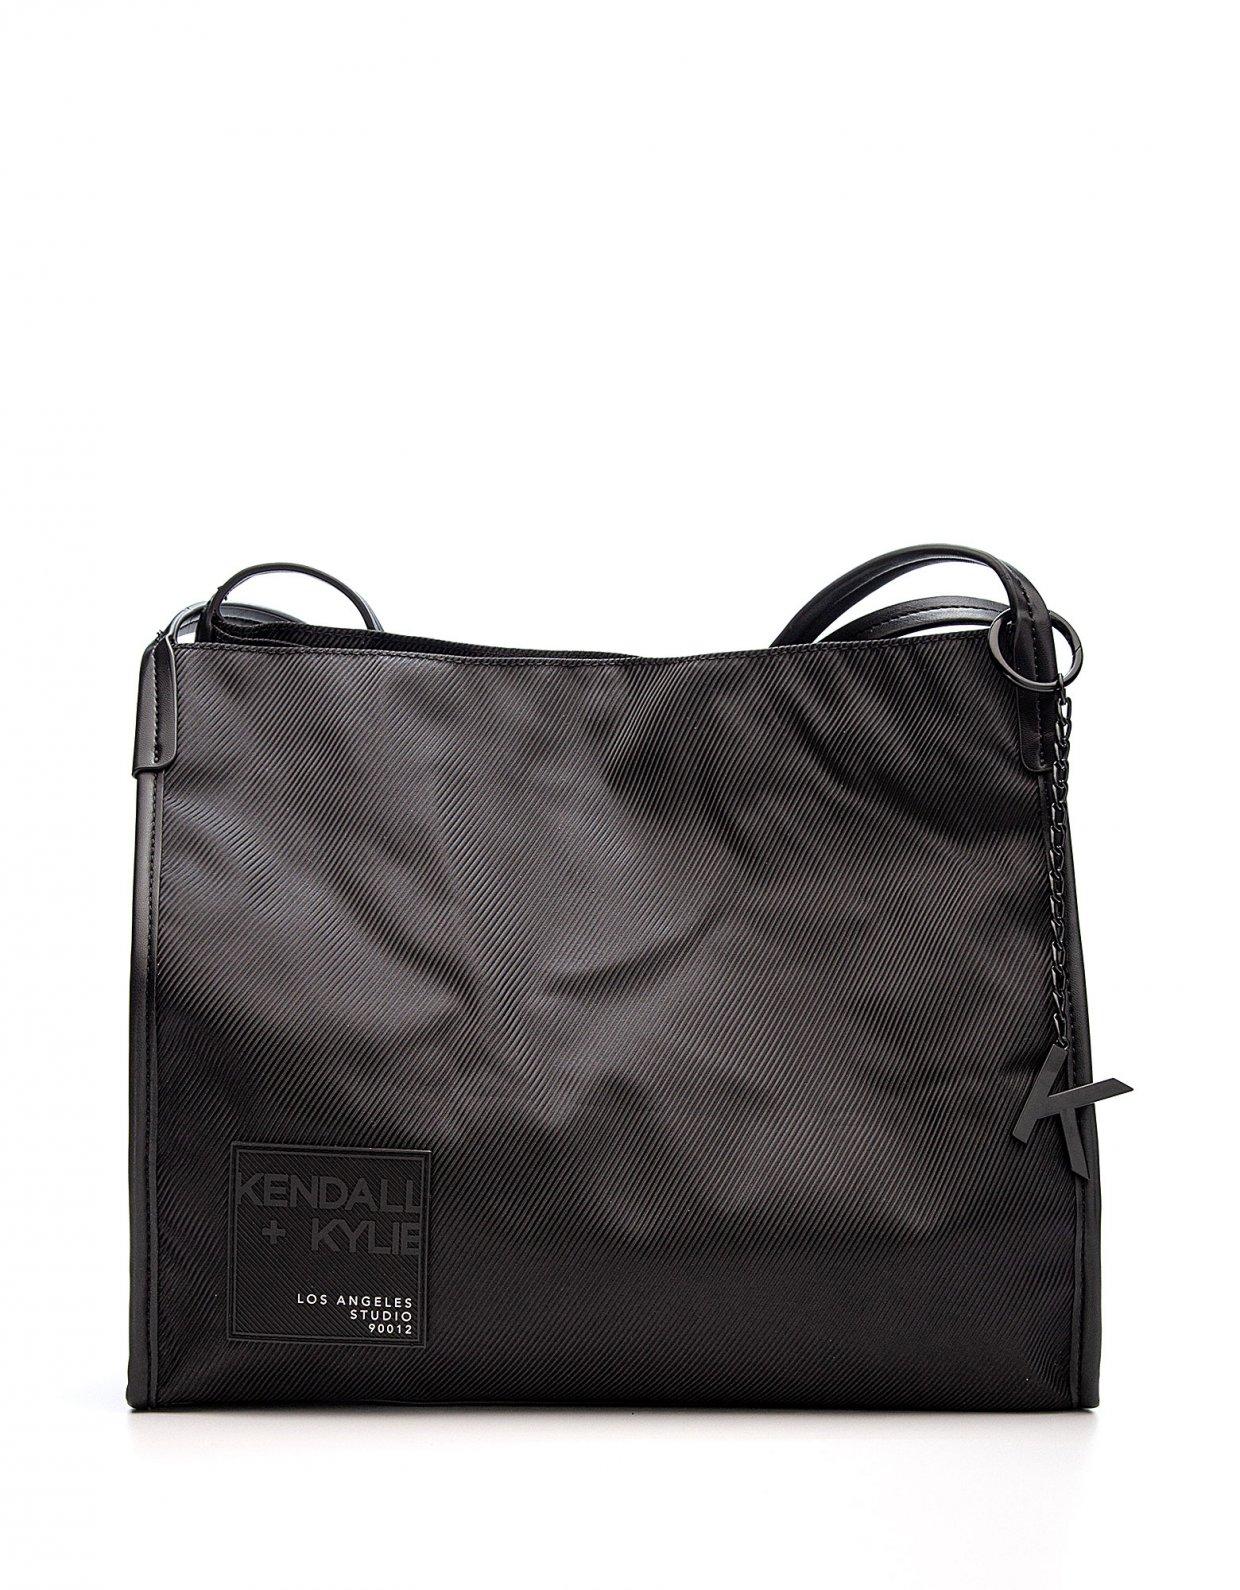 Kendall + Kylie Chrishell tote bag black